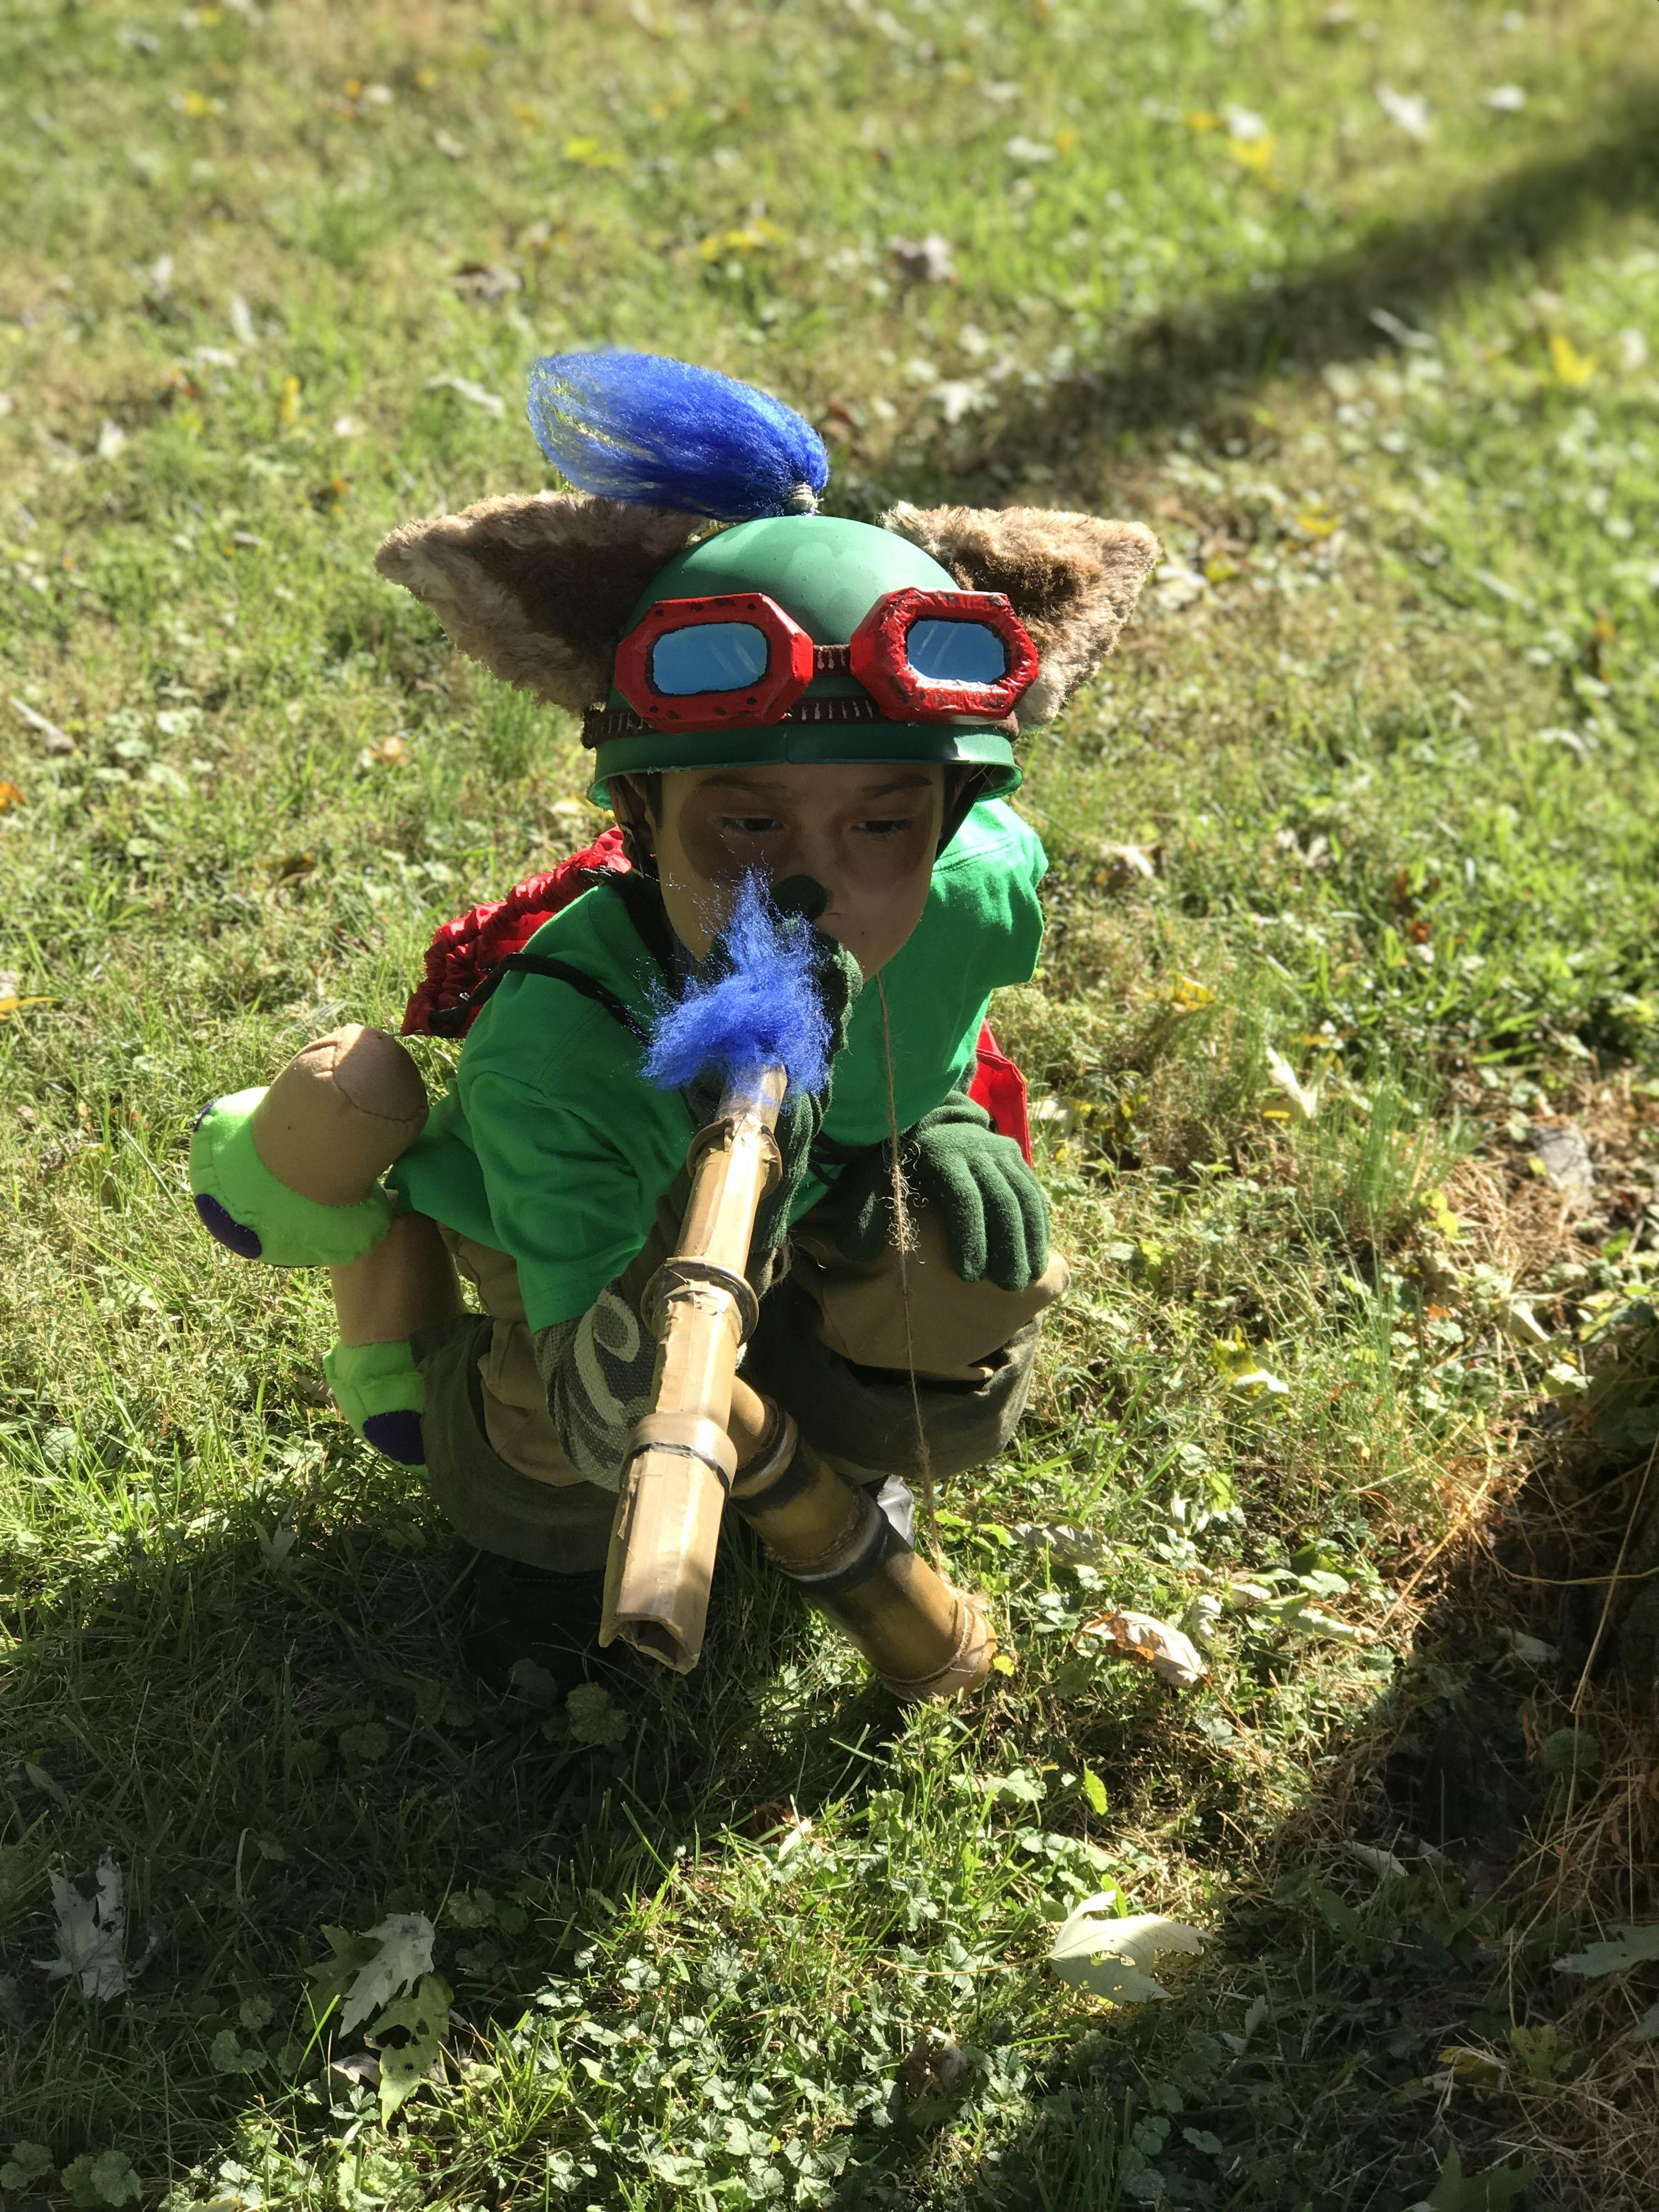 DIY Halloween costume as Teemo & DIY Halloween costume as Teemo | DIY Halloween Fun | Pinterest ...